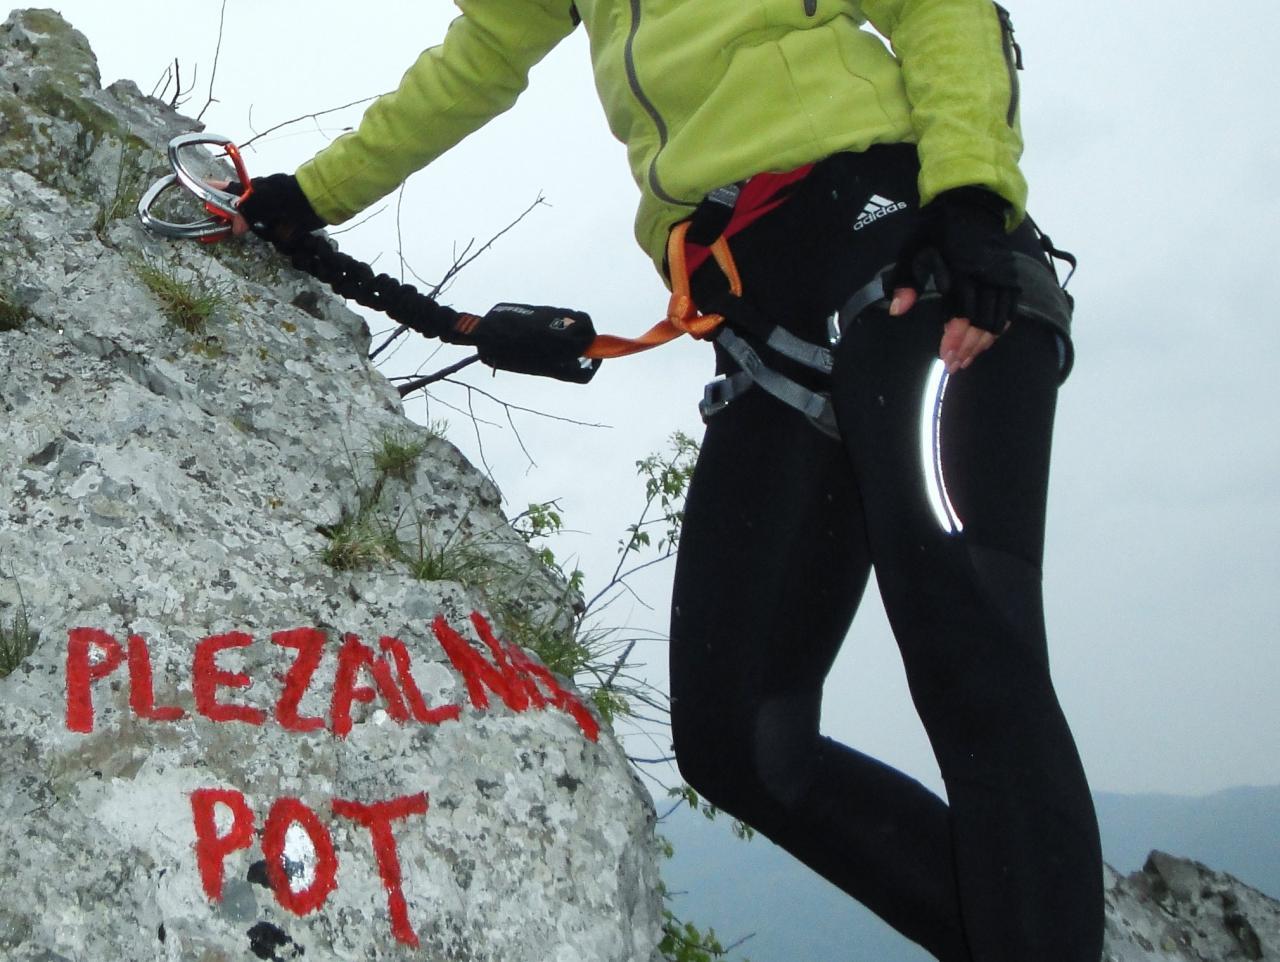 Klettersteigset Black Diamond Easy Rider : Klettersteigset für selbstschutz black diamond easy rider kibuba